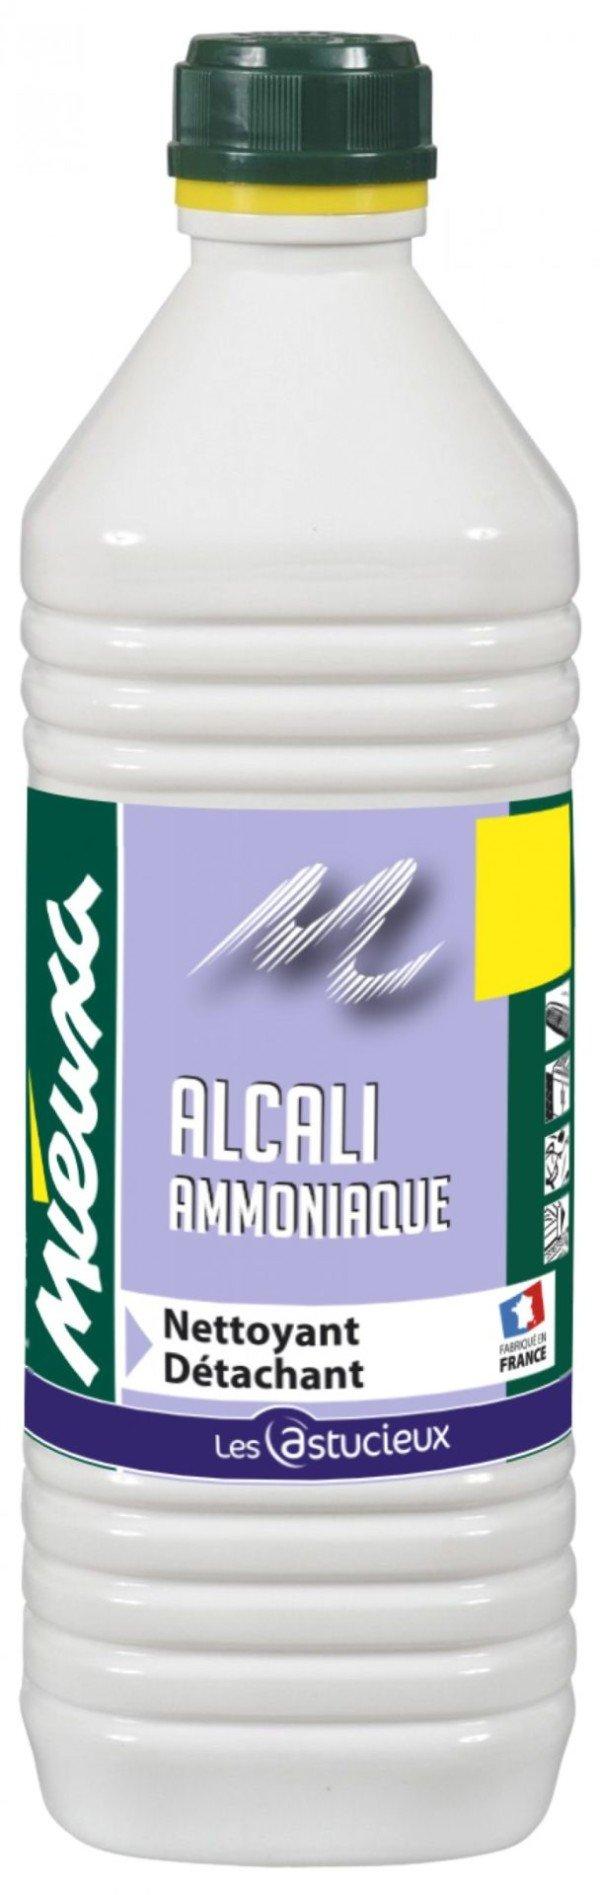 Alcali Amoniaque 13%